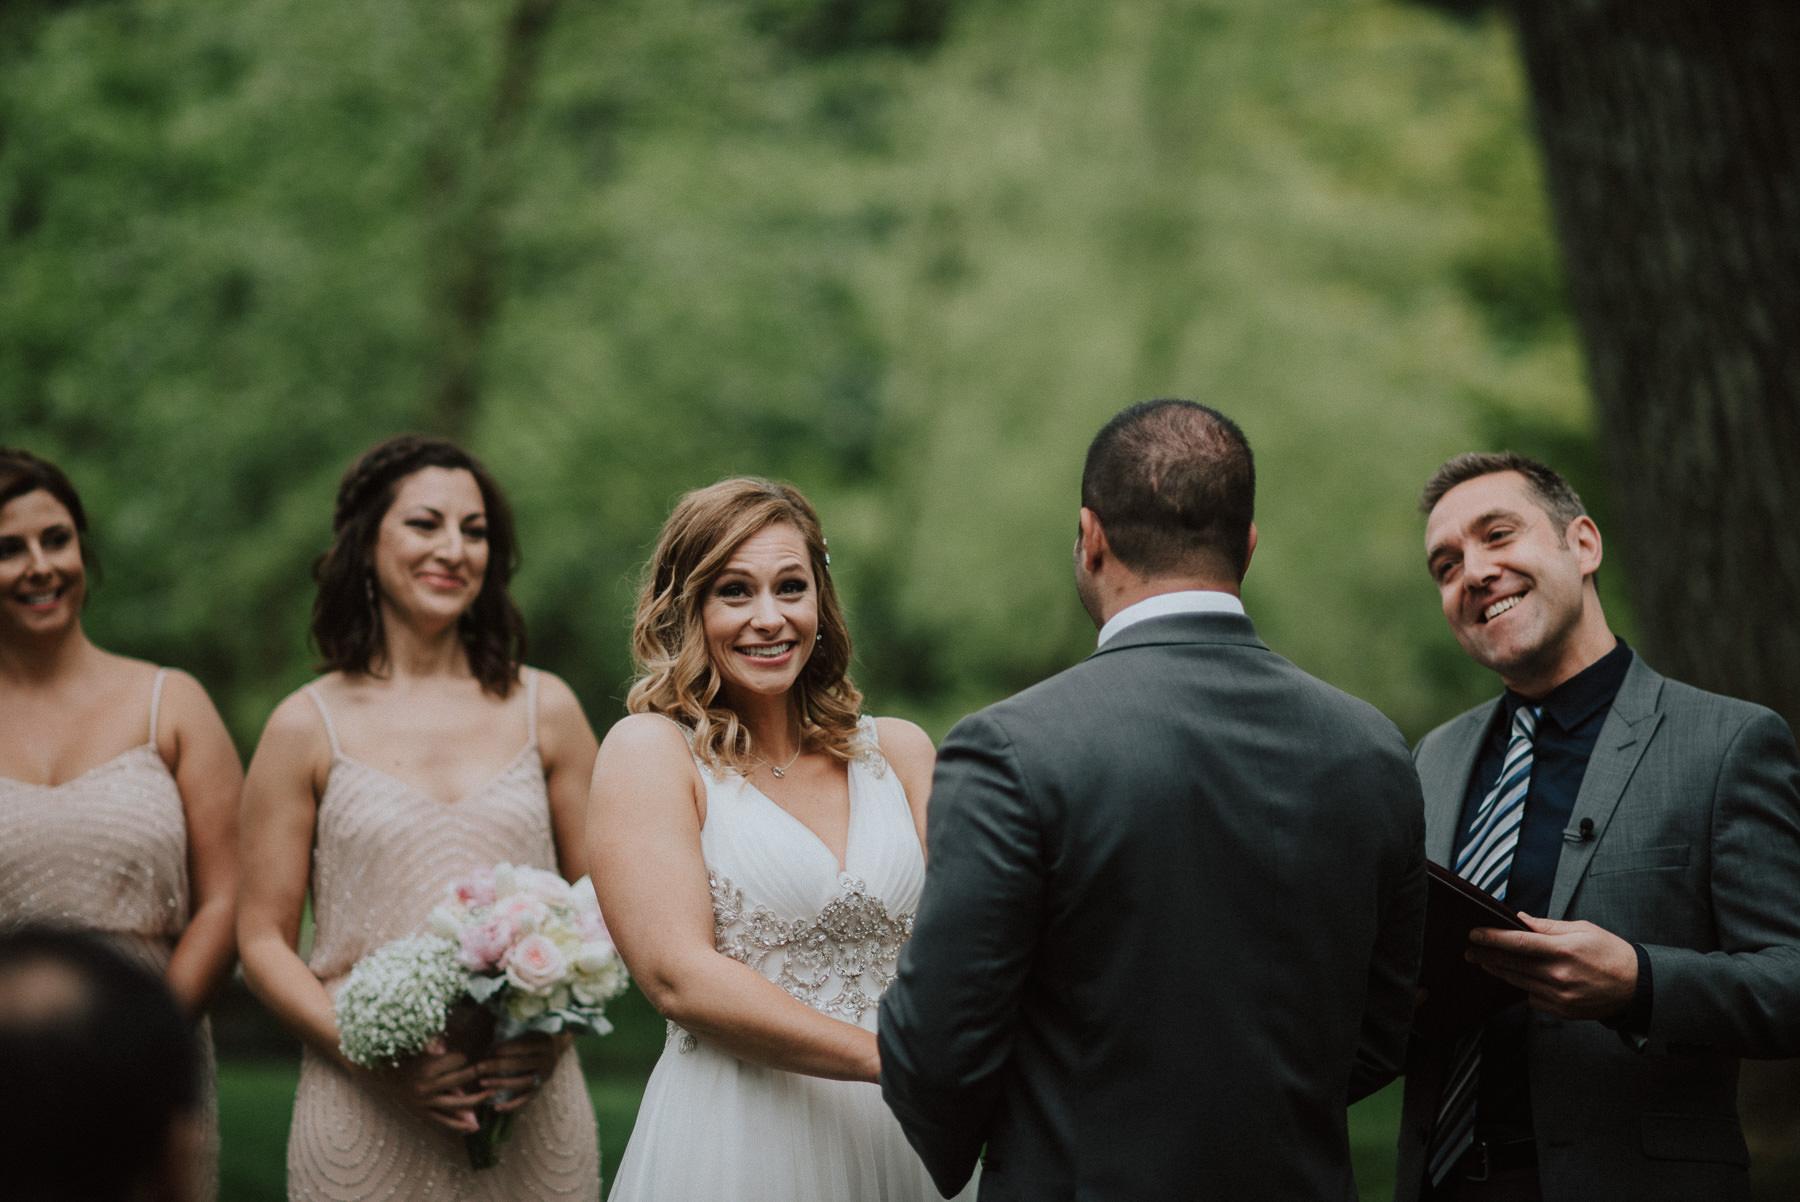 appleford-estate-wedding-photography-59.jpg